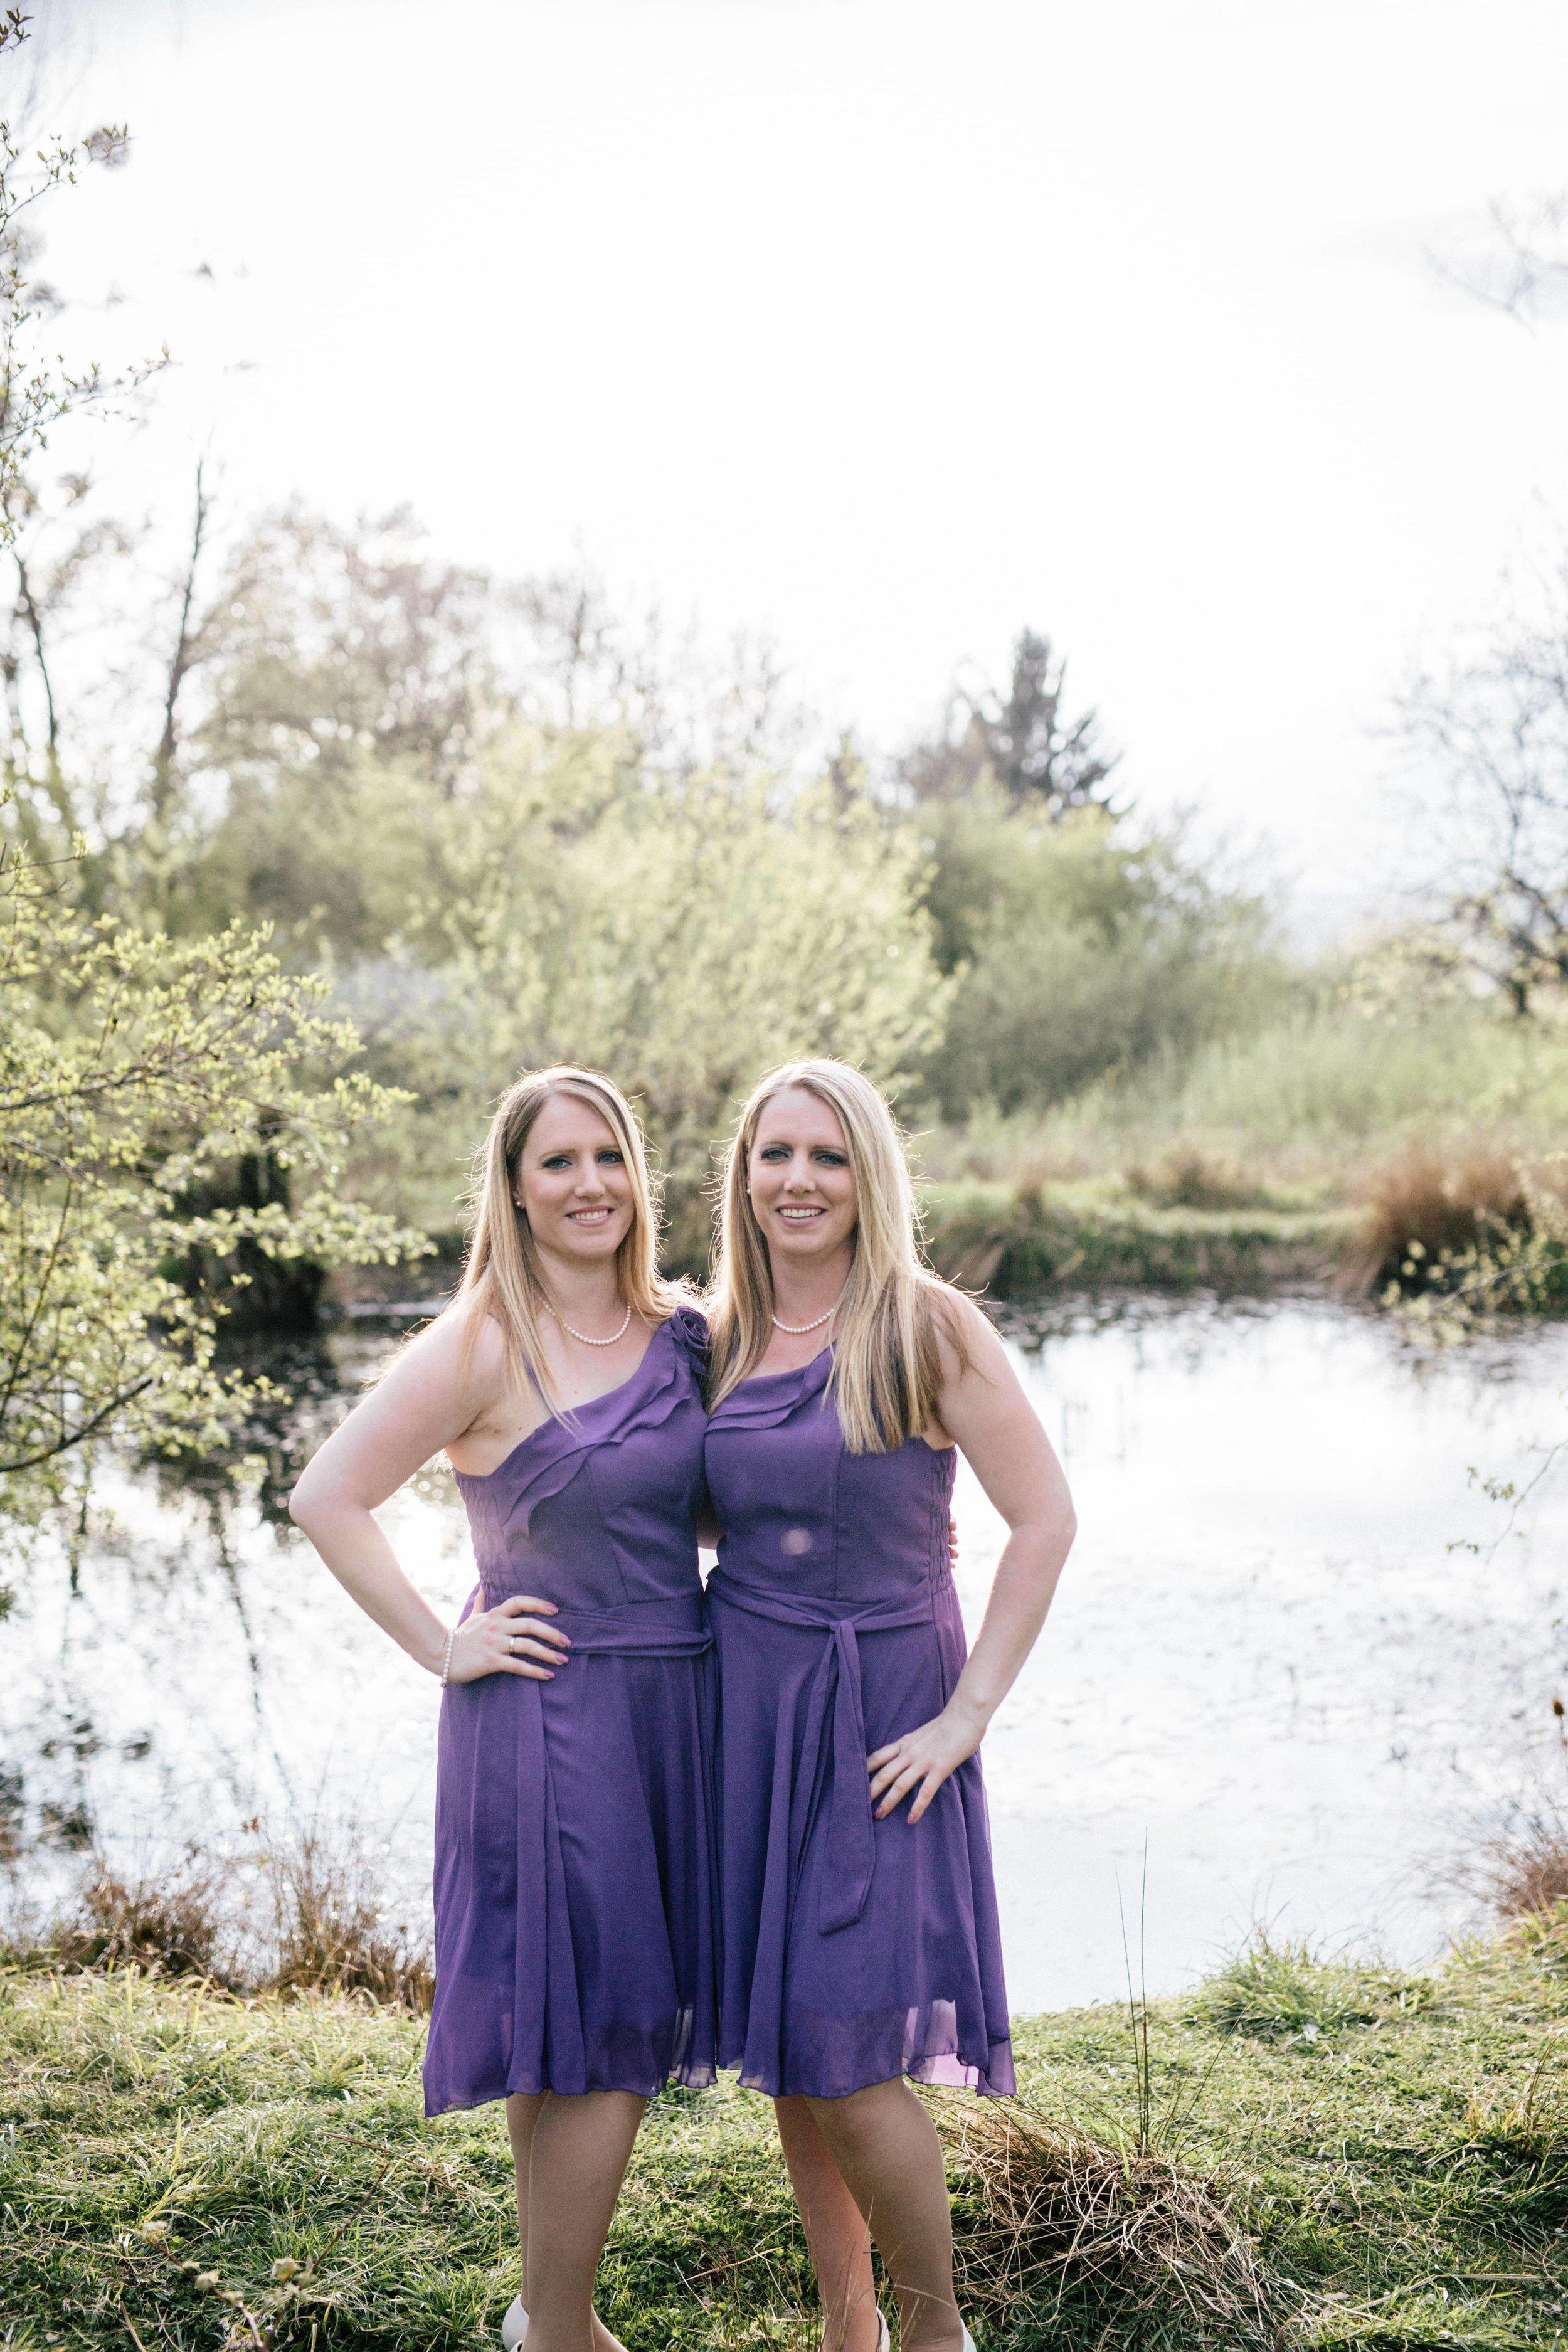 Zwillinge-146.jpg